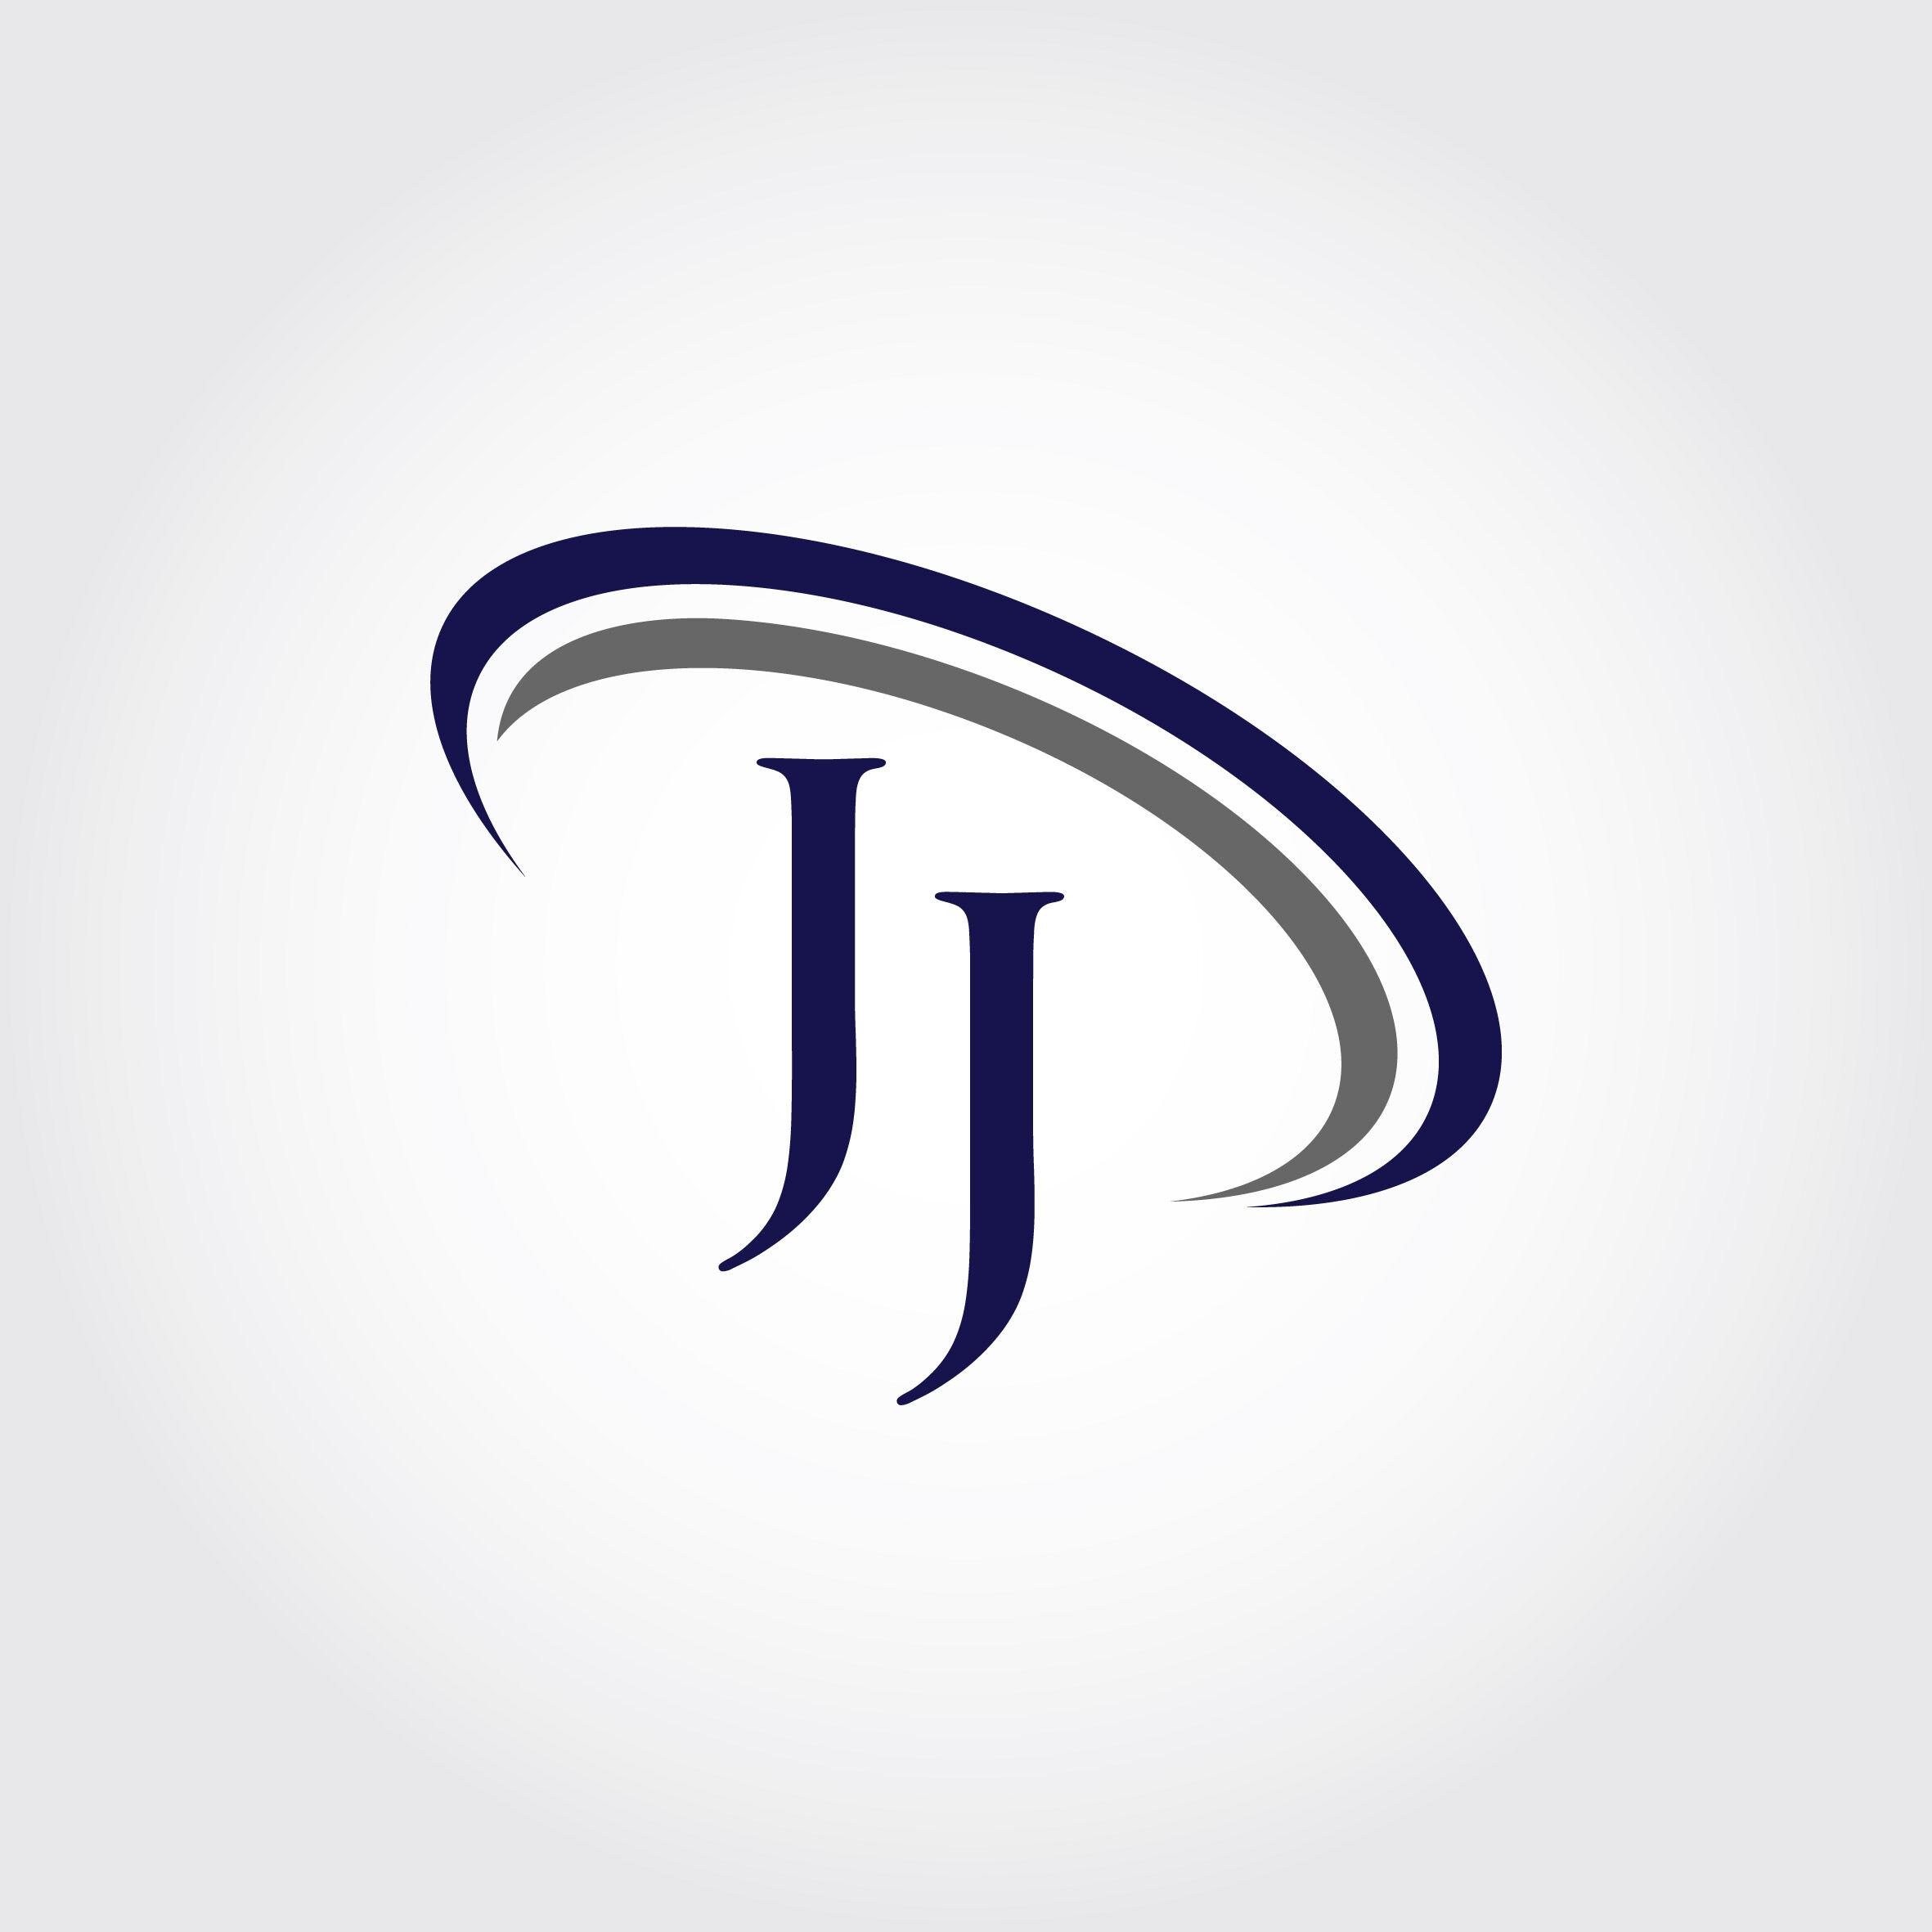 Monogram JJ Logo Design By Vectorseller.